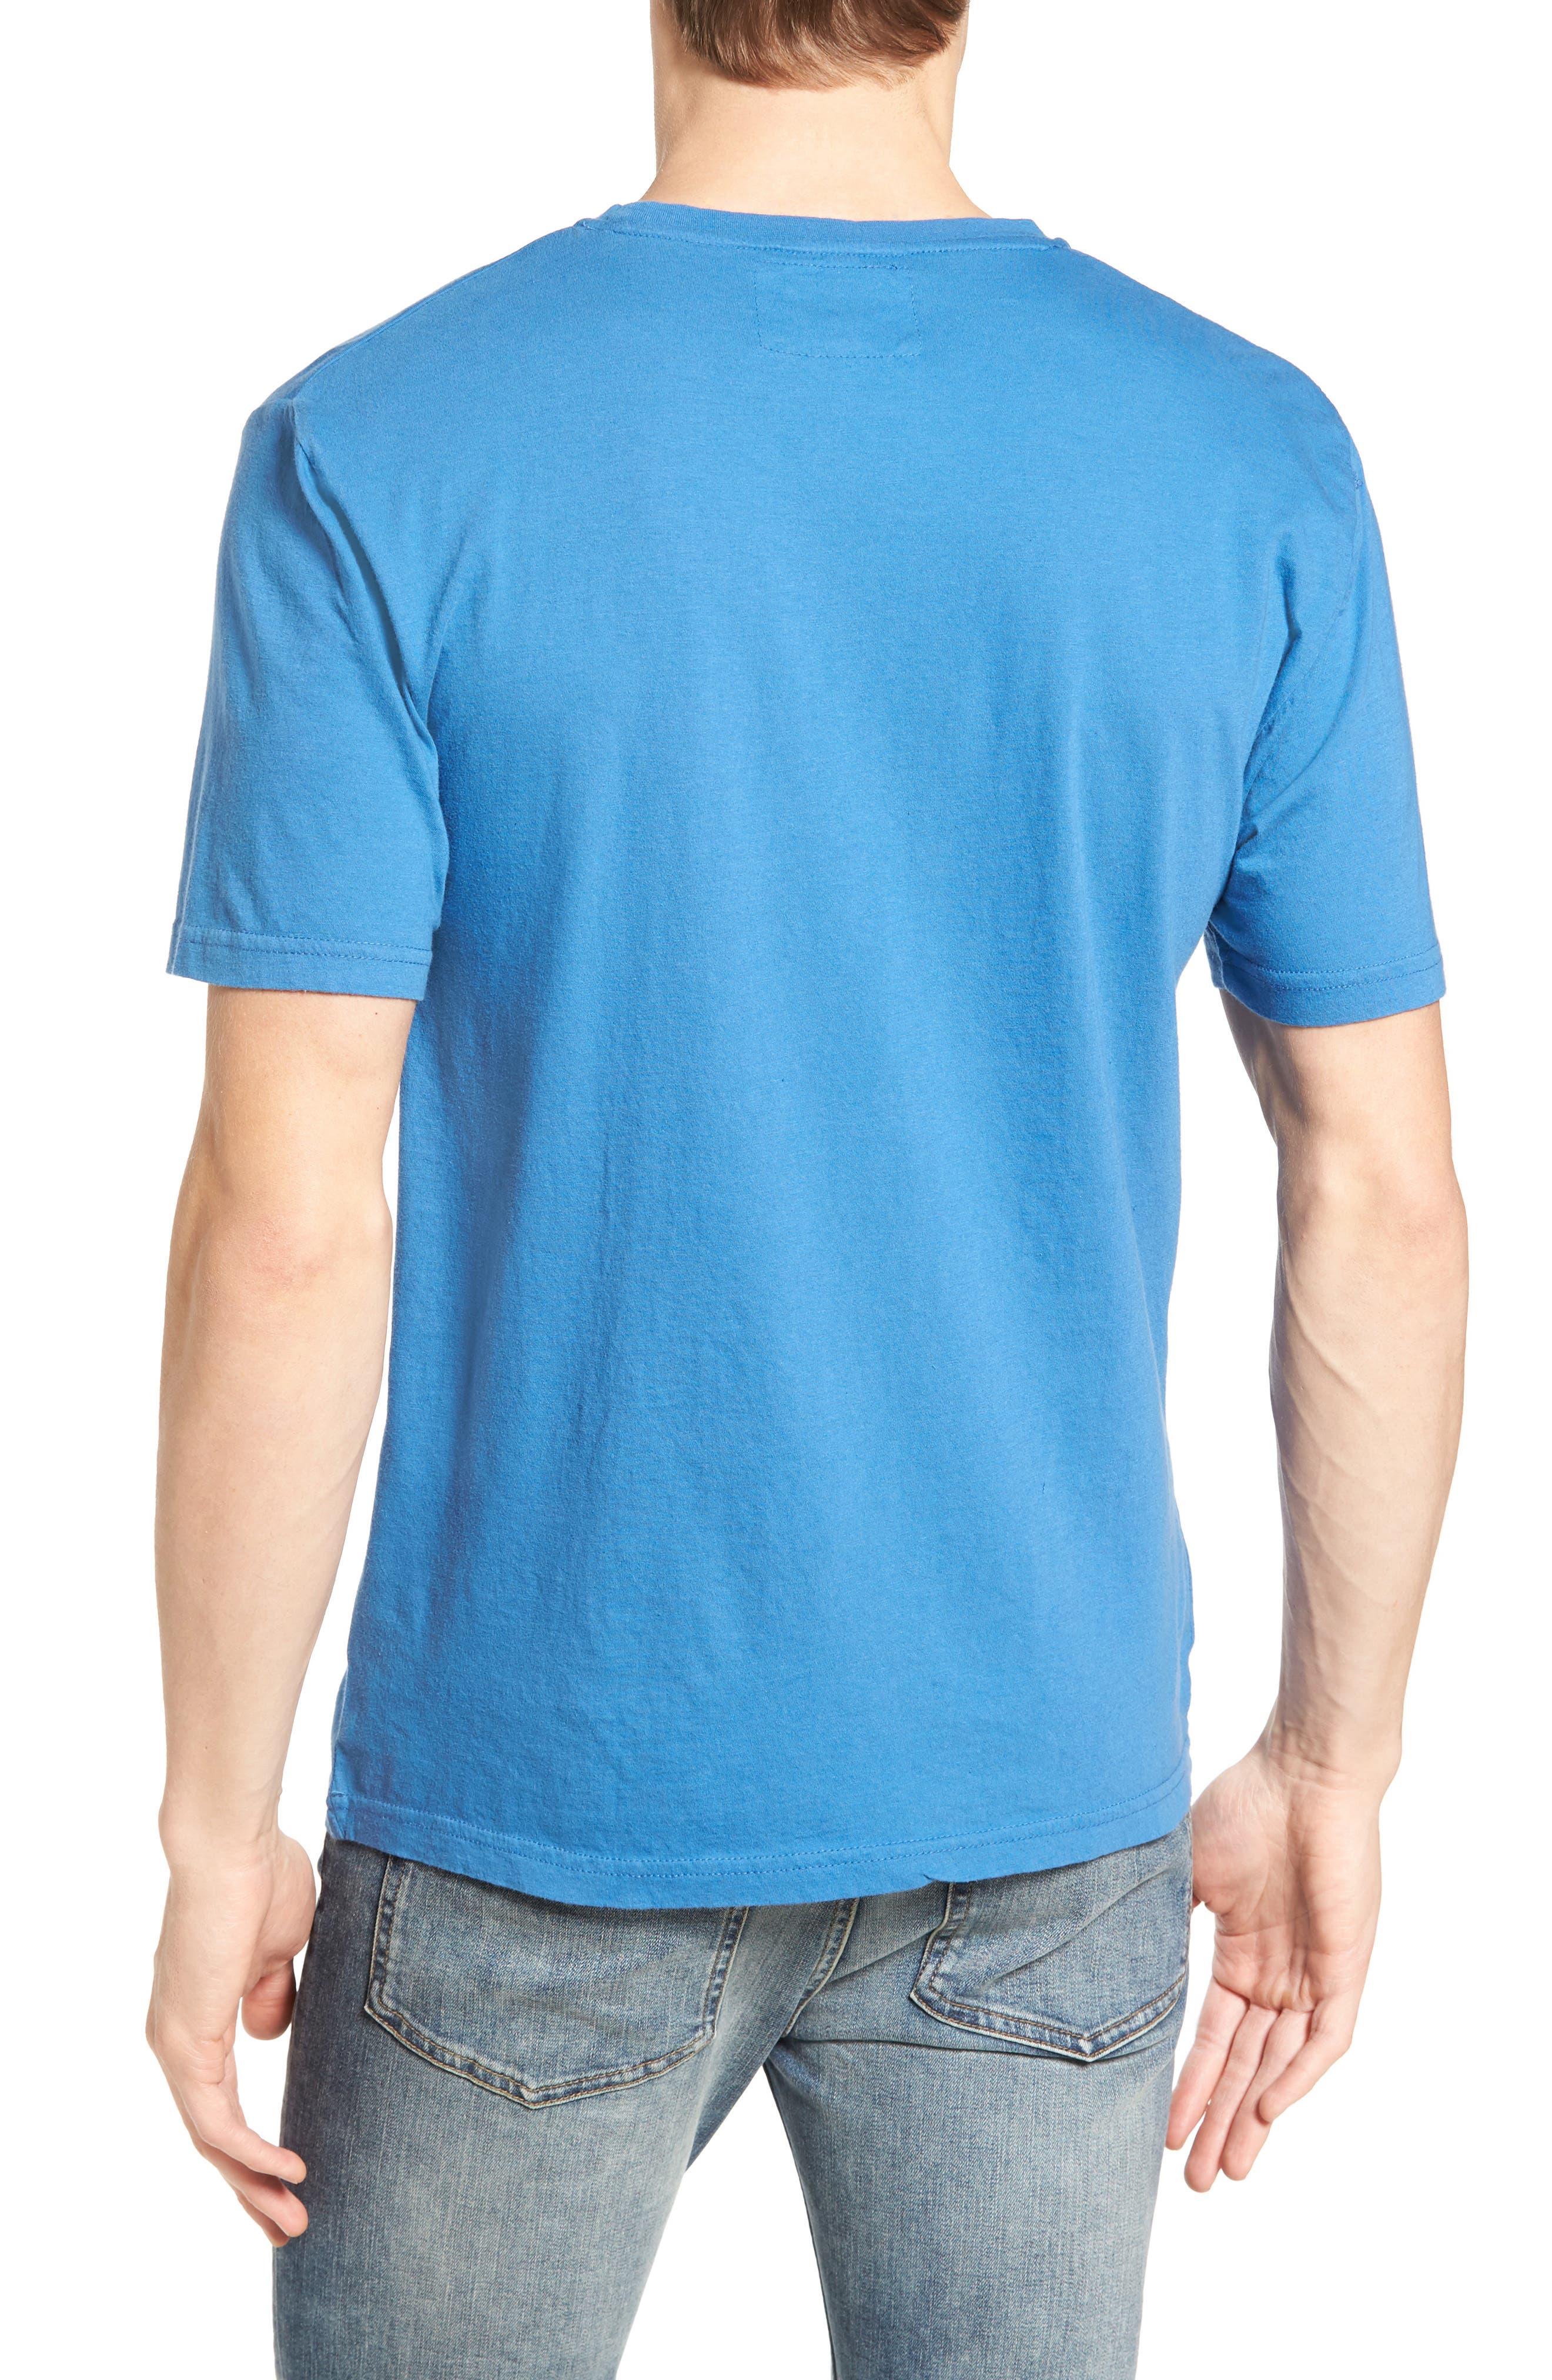 Brass Tack Texas Rangers T-Shirt,                             Alternate thumbnail 2, color,                             450